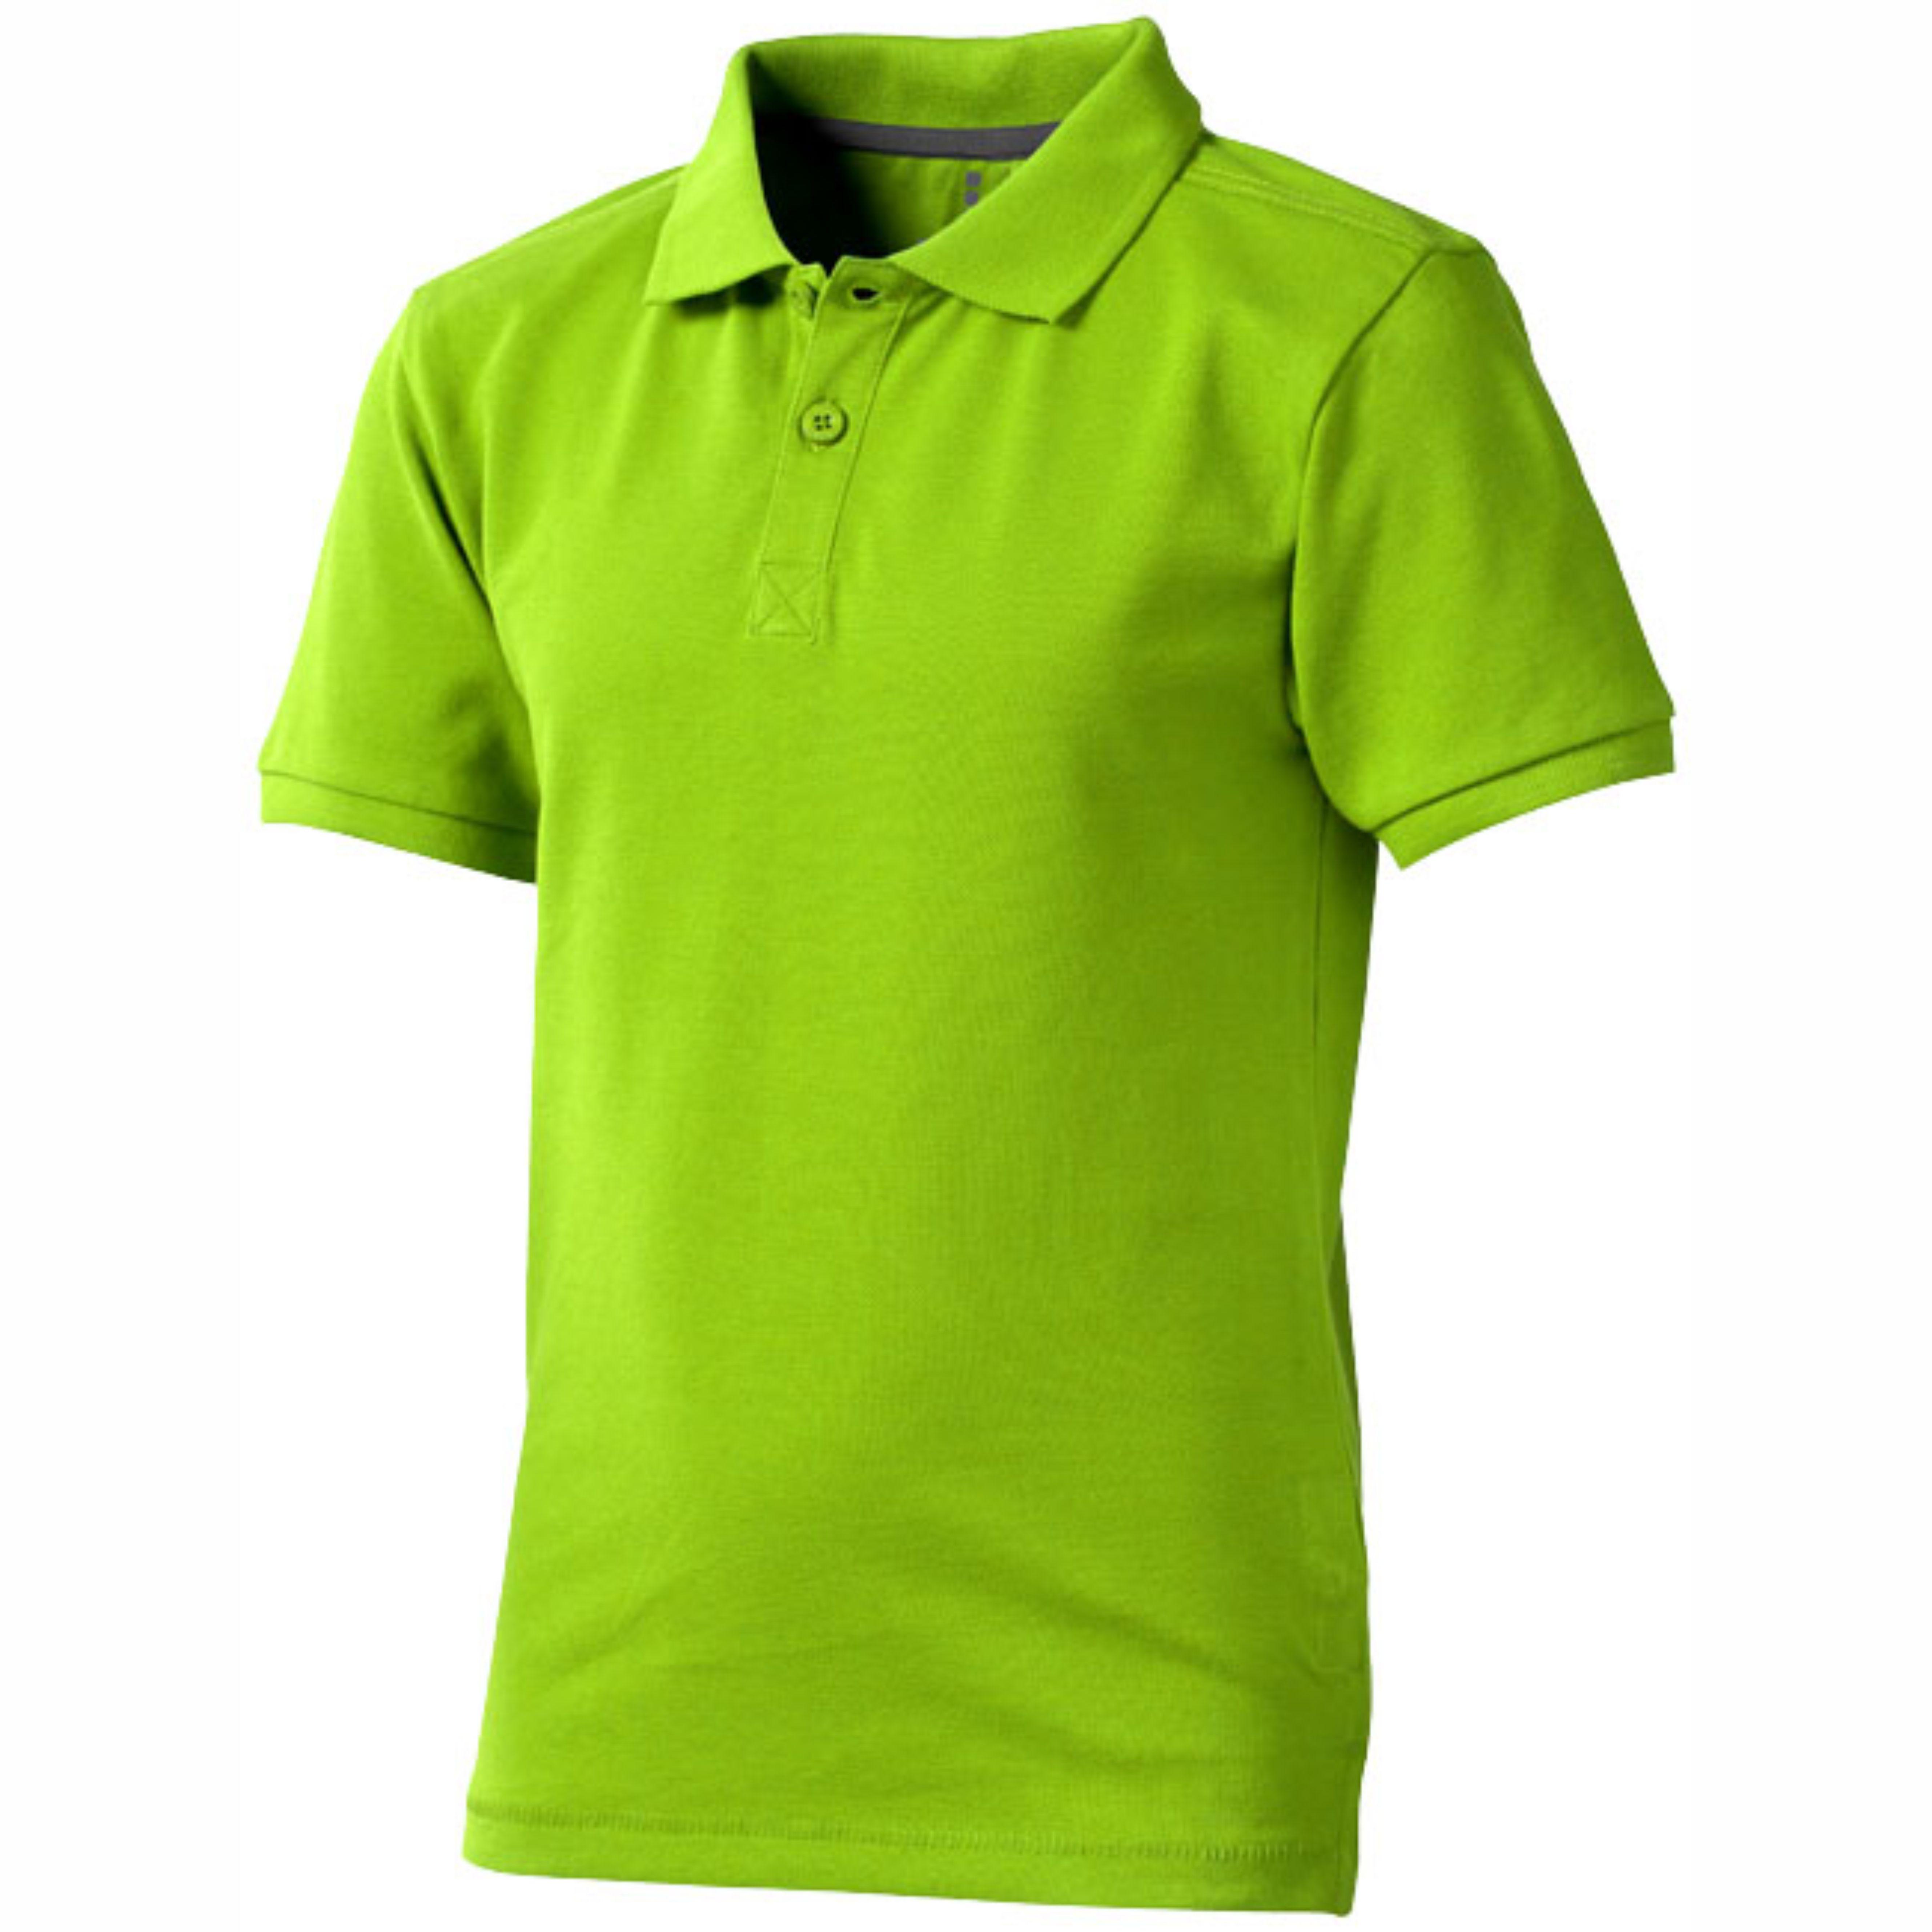 Polo manga corta de niño color verde Elevate 2338082